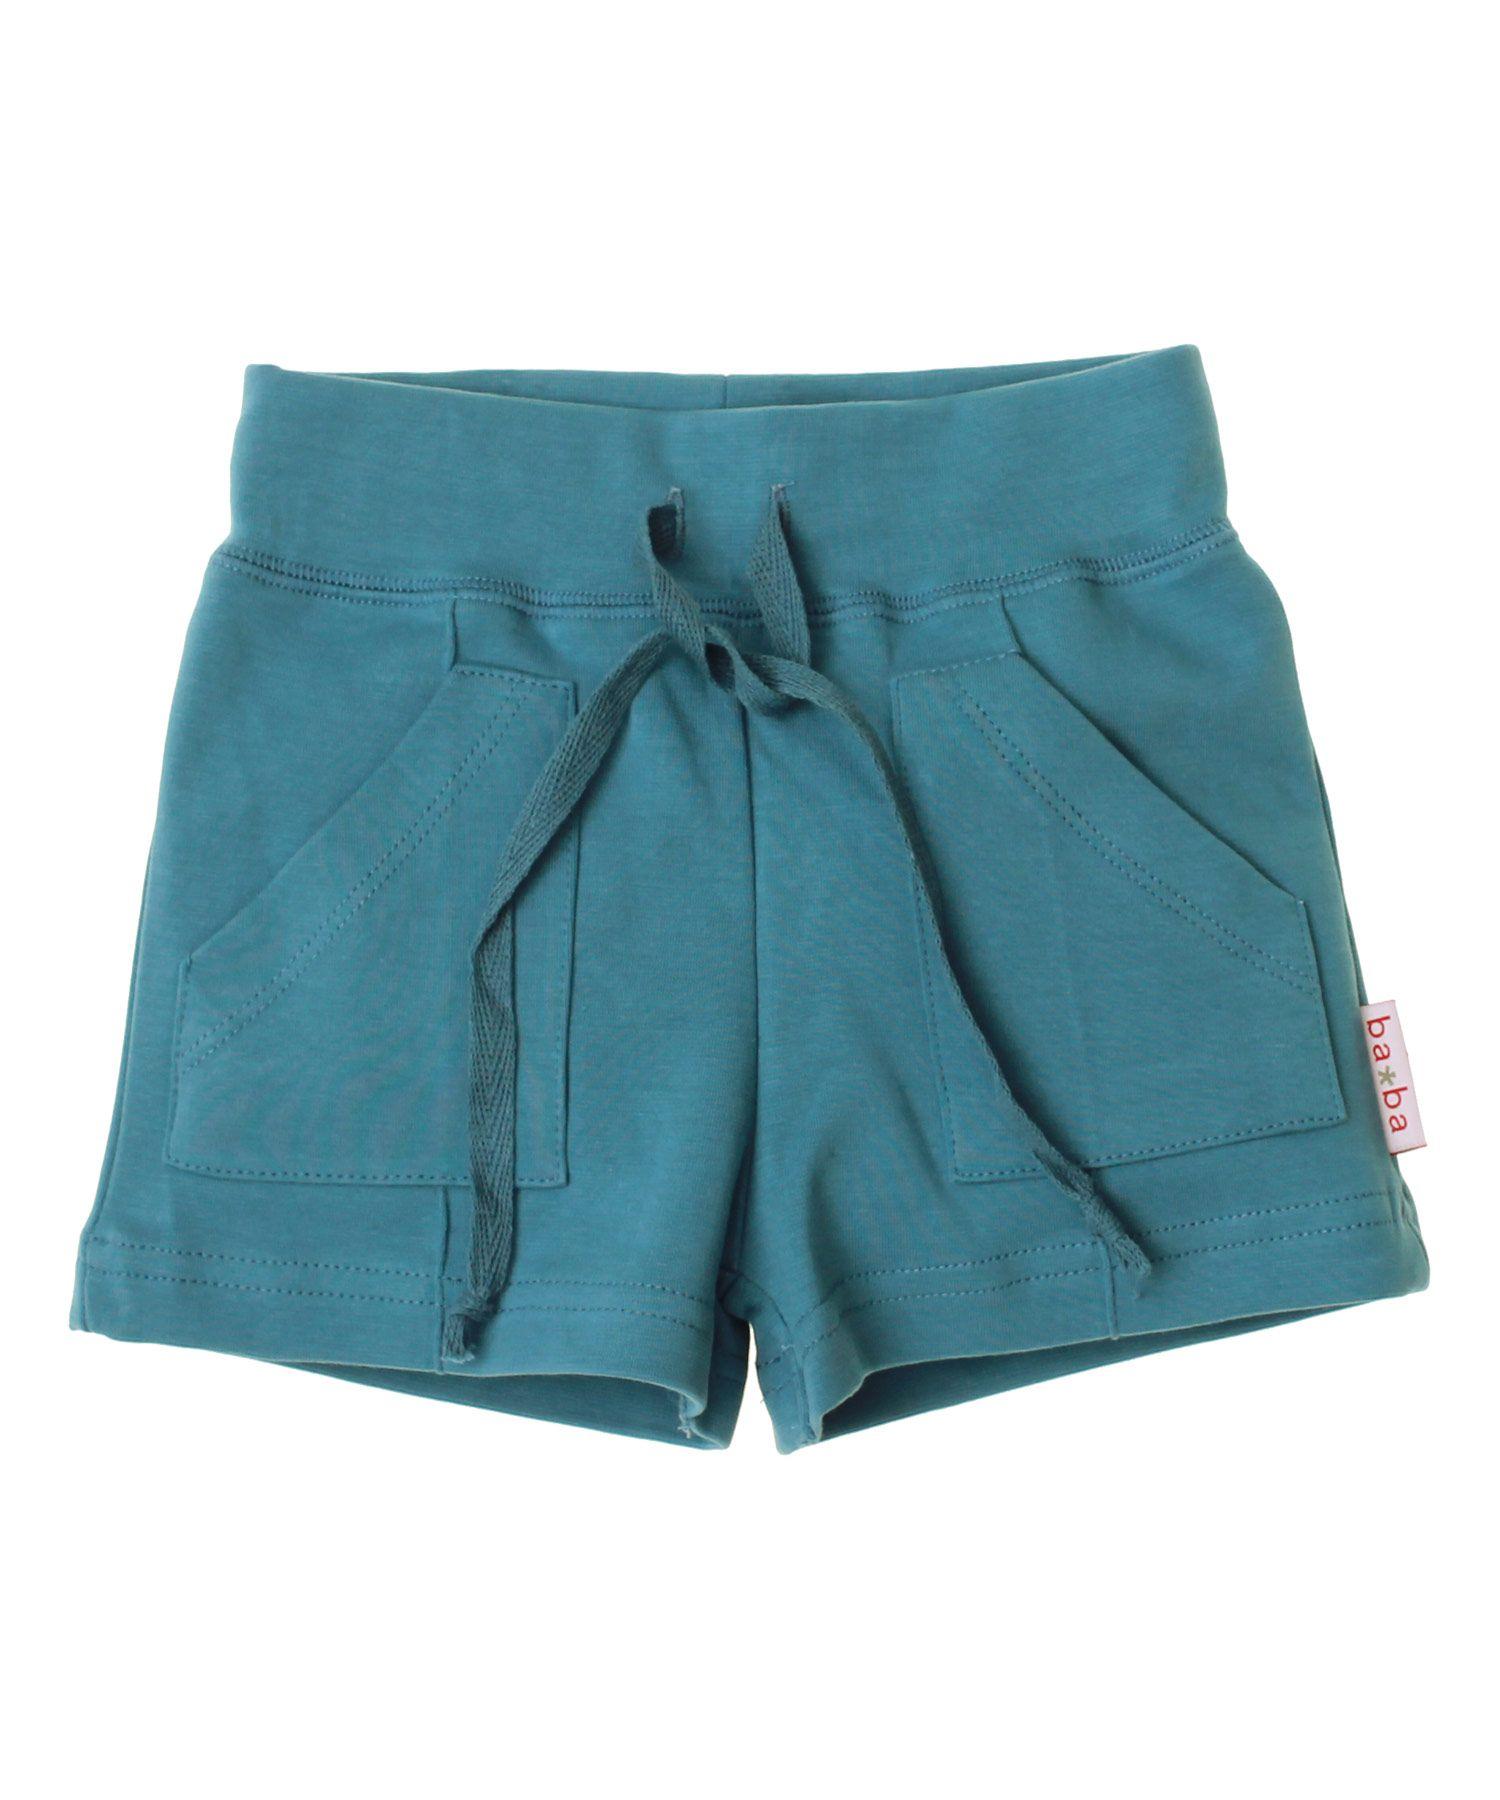 Baba Babywear super funky blue milano pocket shorts. baba-babywear.en.emilea.be